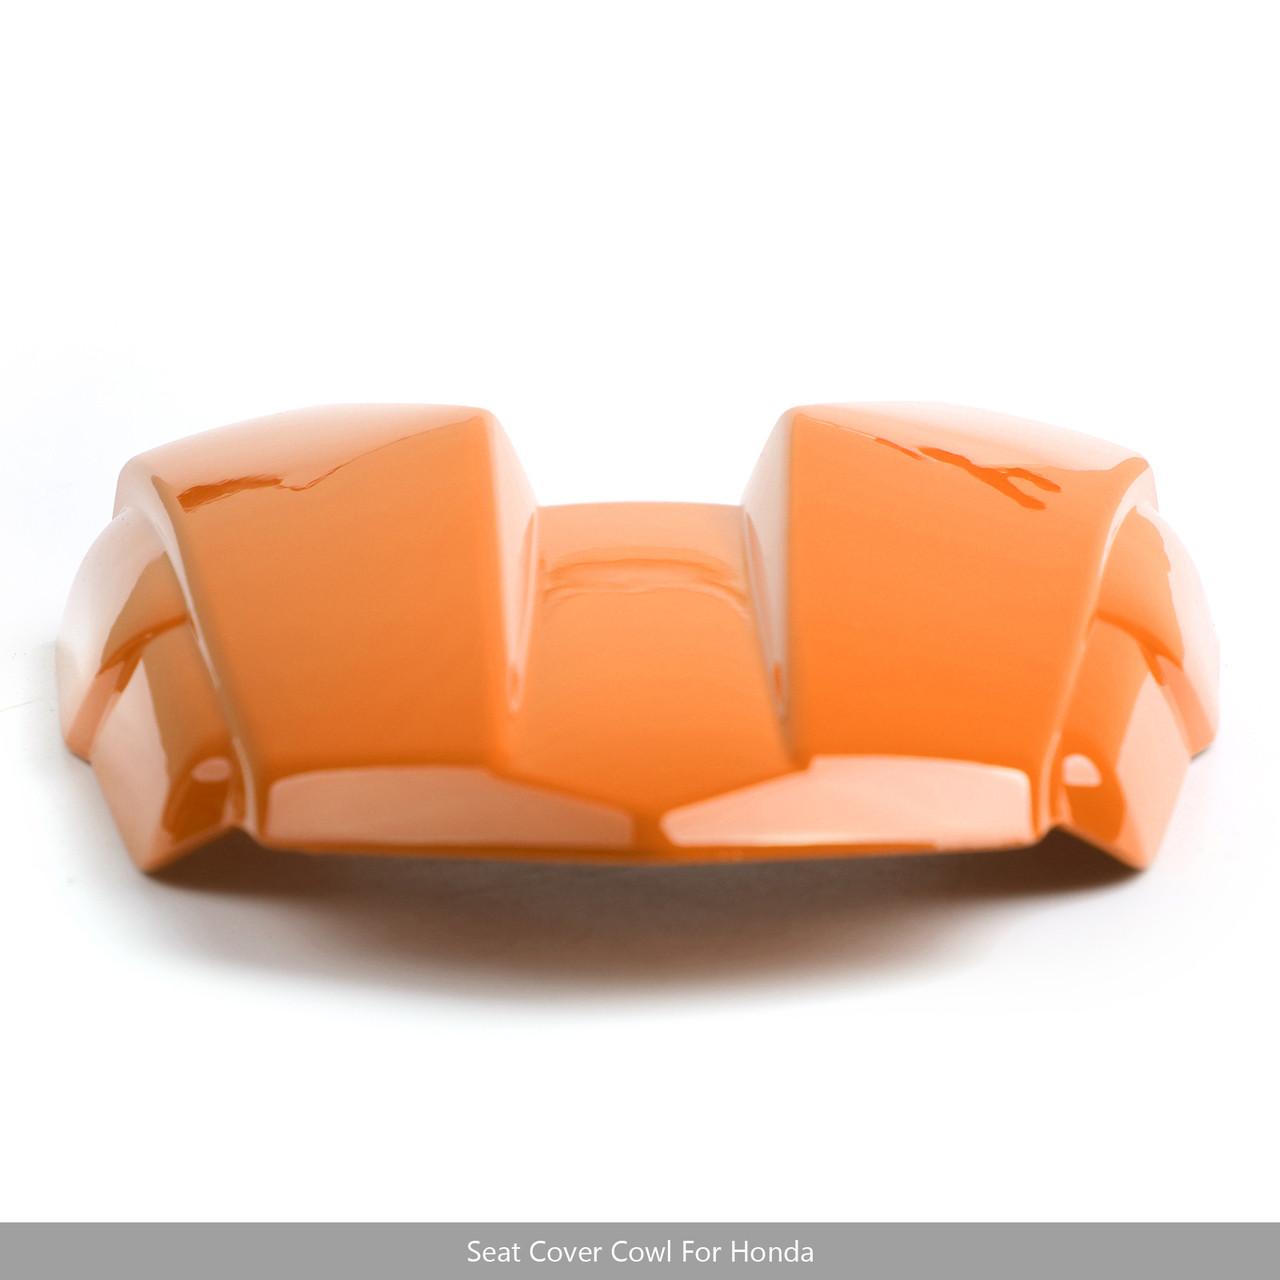 Rear Seat Cover Cowl Fairing Body Tail For Honda CB500F CBR500R 2016-2018 Orange